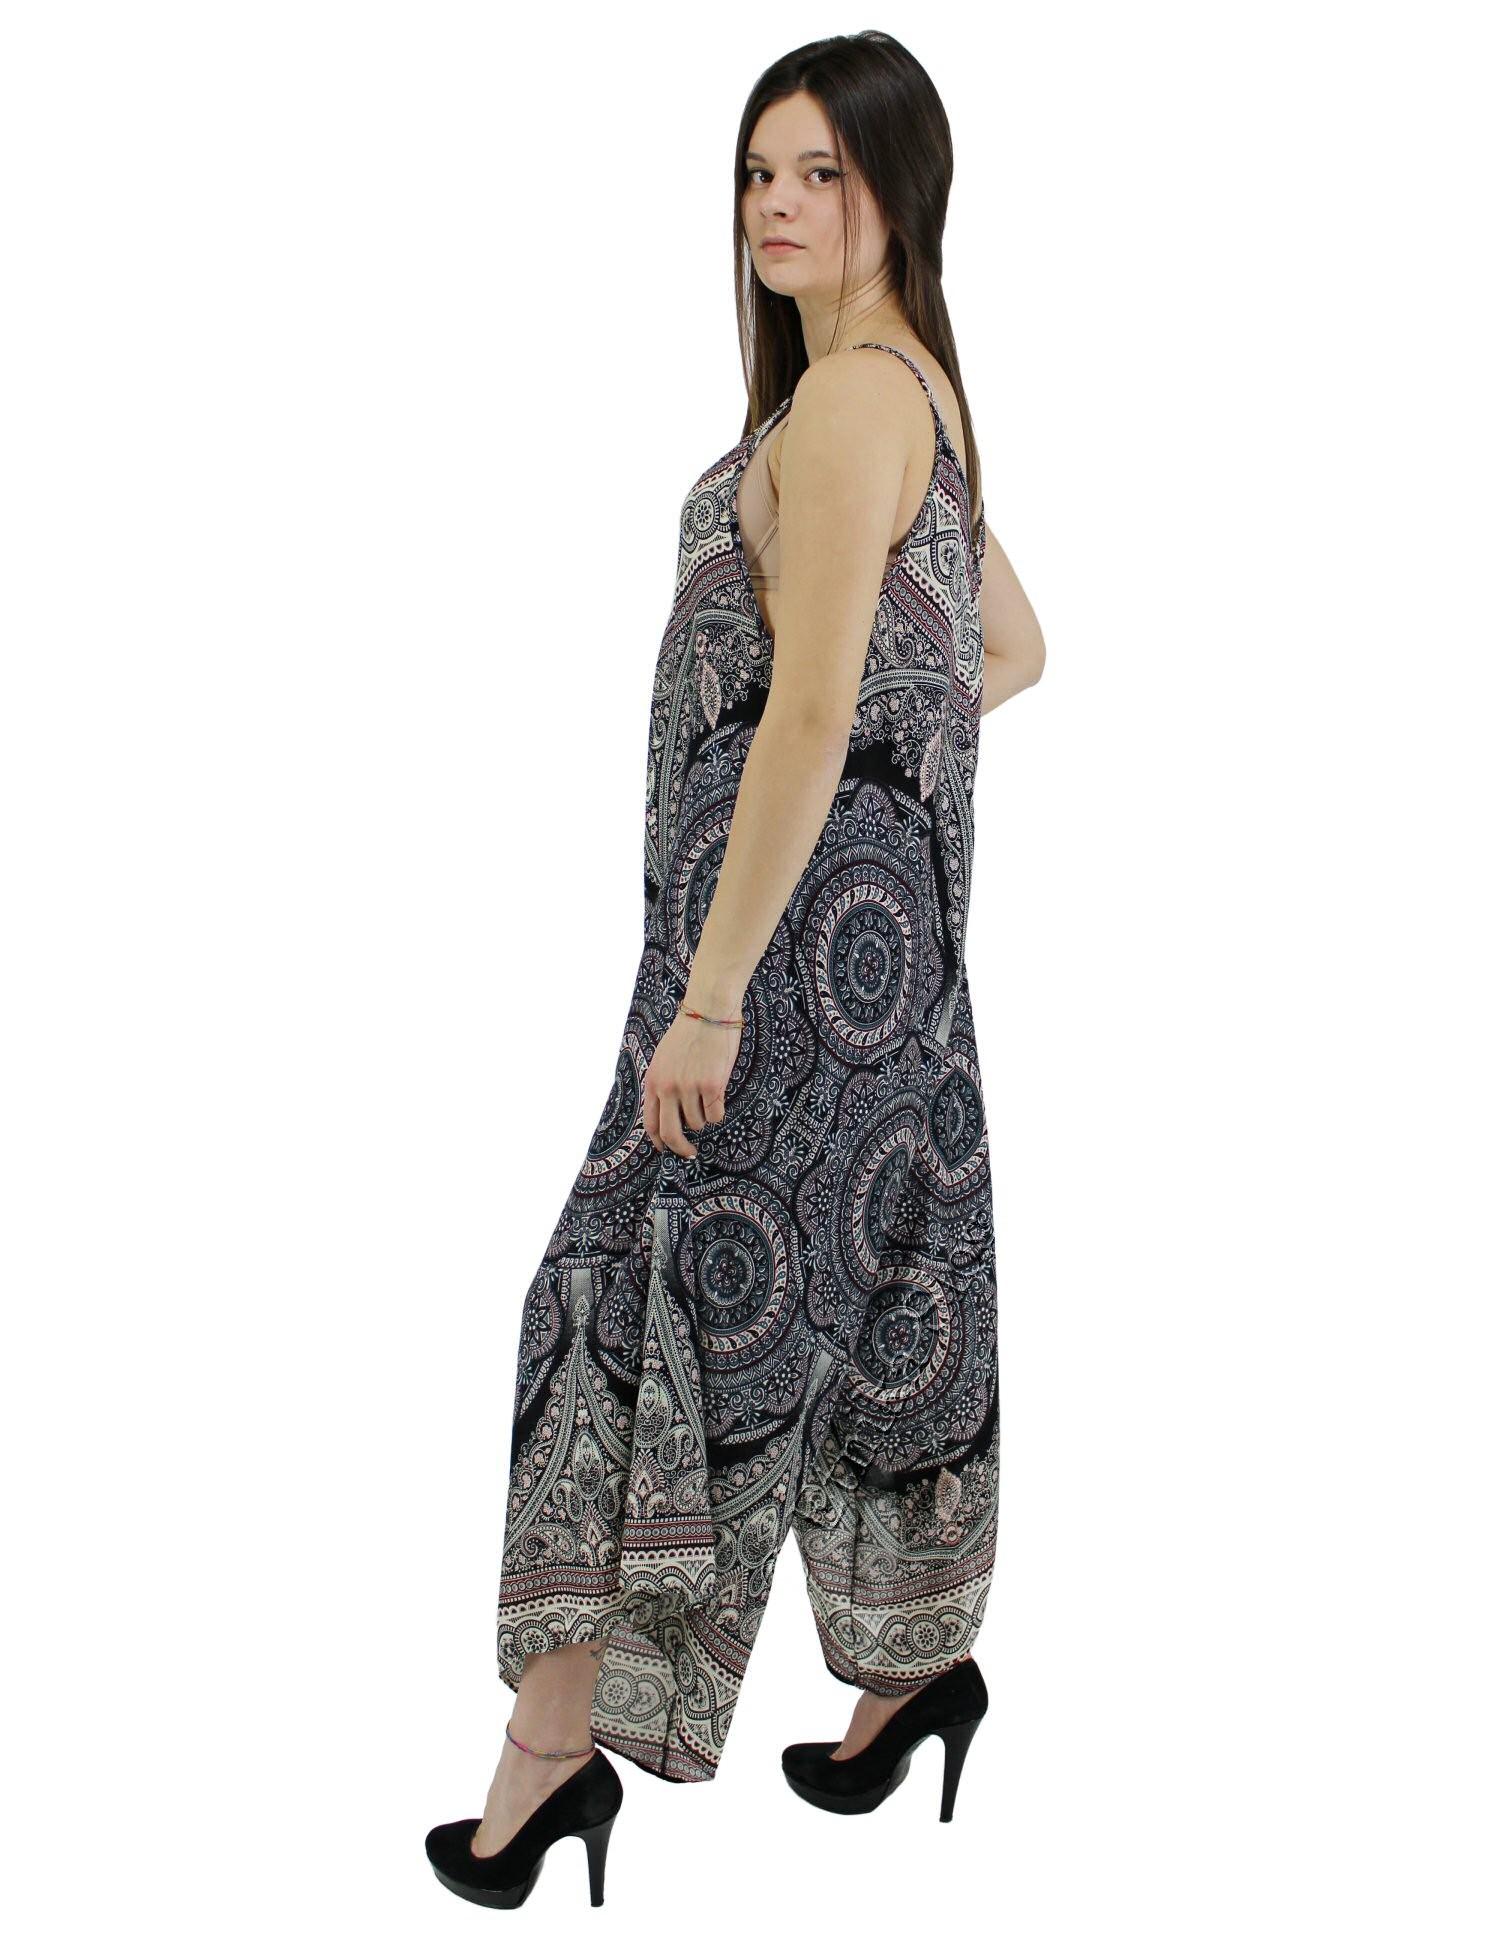 VISCOSE SUMMER DRESSES AB-BCV16DB - Etnika Slog d.o.o.